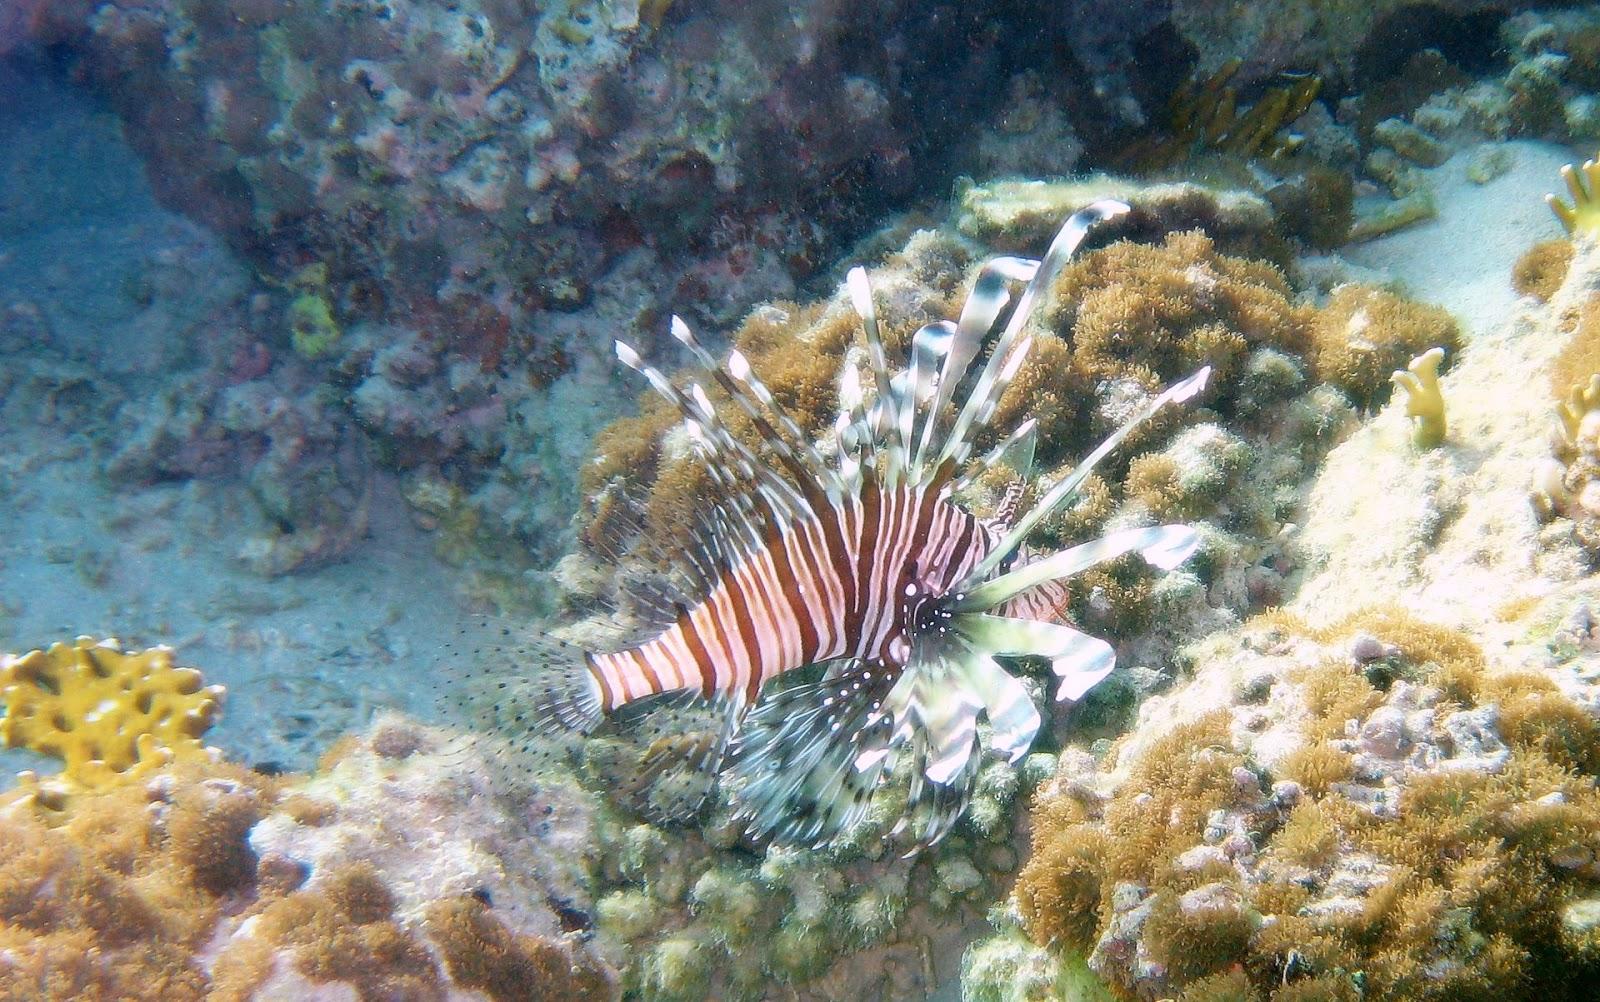 http://4.bp.blogspot.com/-feL1HZNC25w/UH1HlqQ1sDI/AAAAAAAAEXo/olASls5TxHU/s1600/liofinsh-underwater-ocean-wallpaper-1920x1200-248.jpg